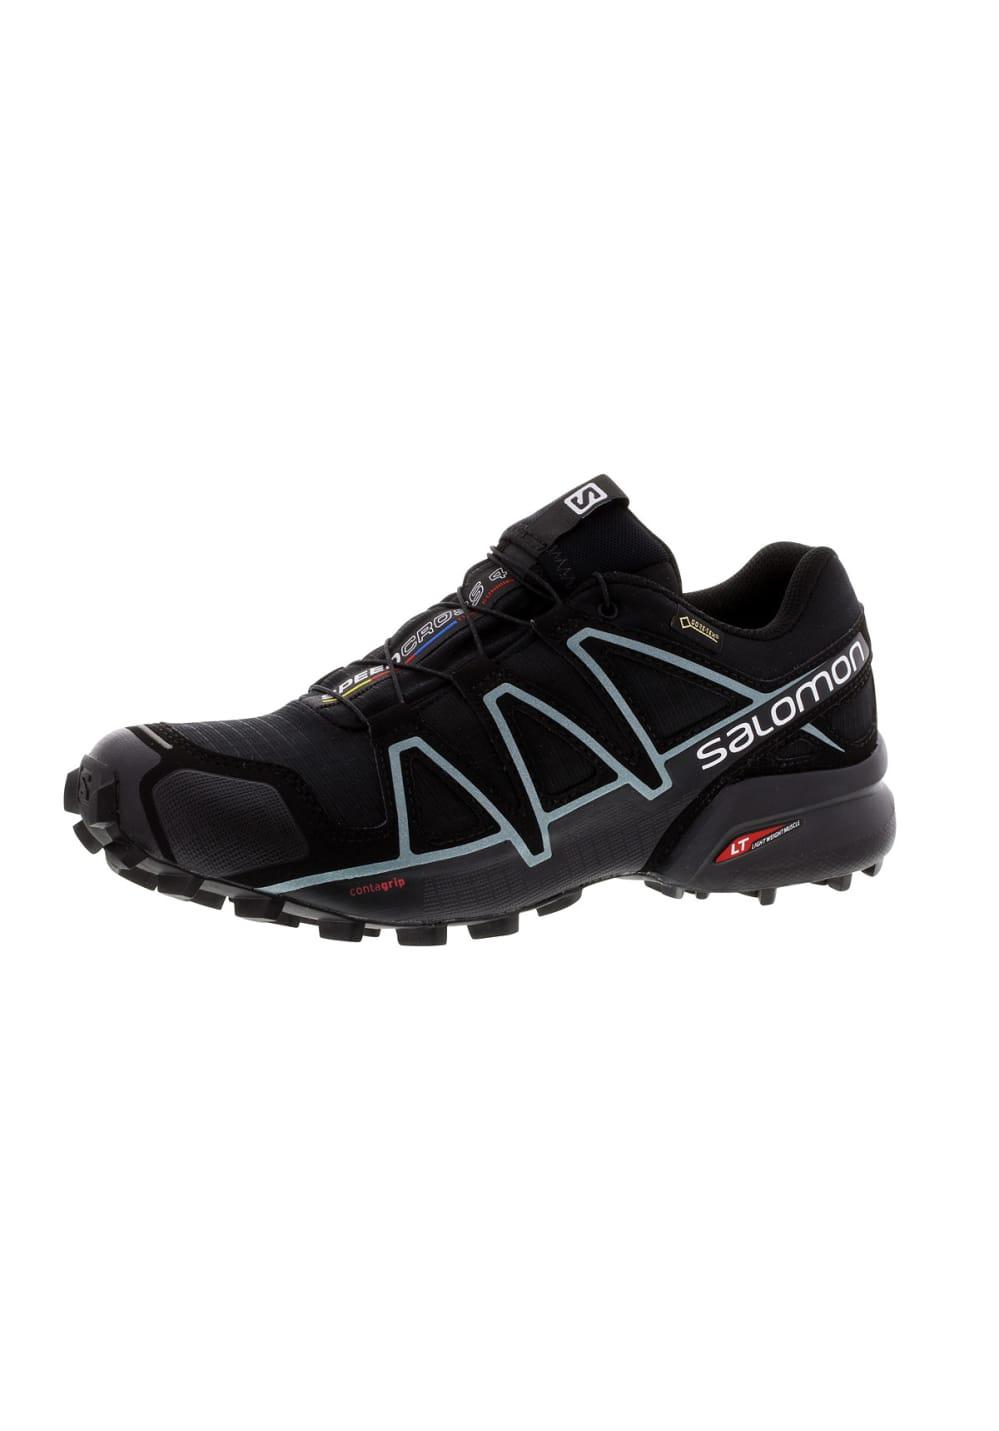 d0c480427c5 Salomon Speedcross 4 GTX - Running shoes for Women - Black | 21RUN